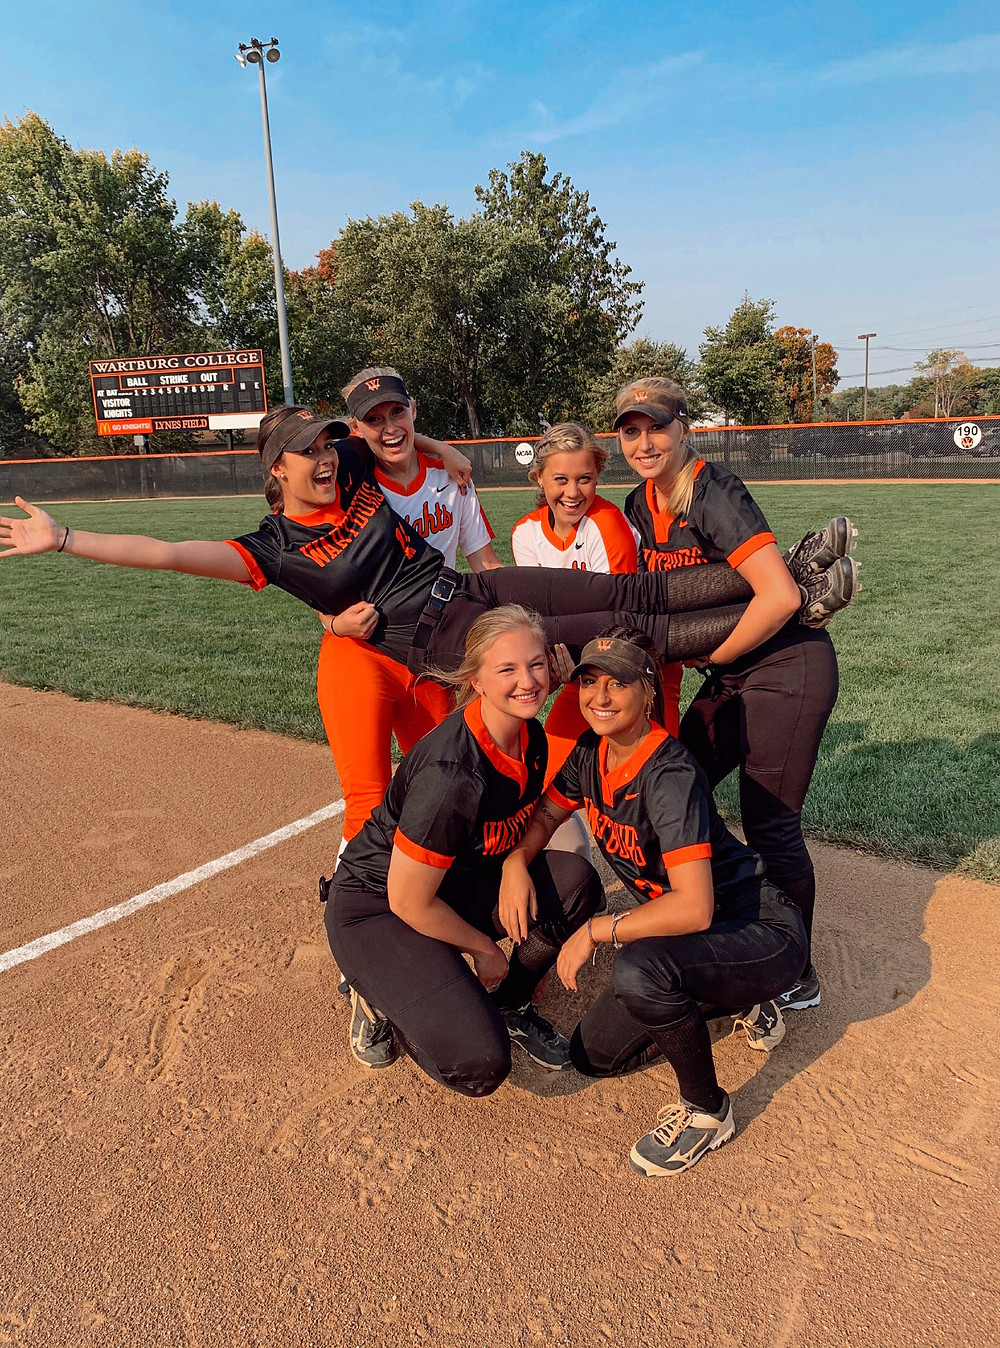 Lauren posing with her softball teammates.